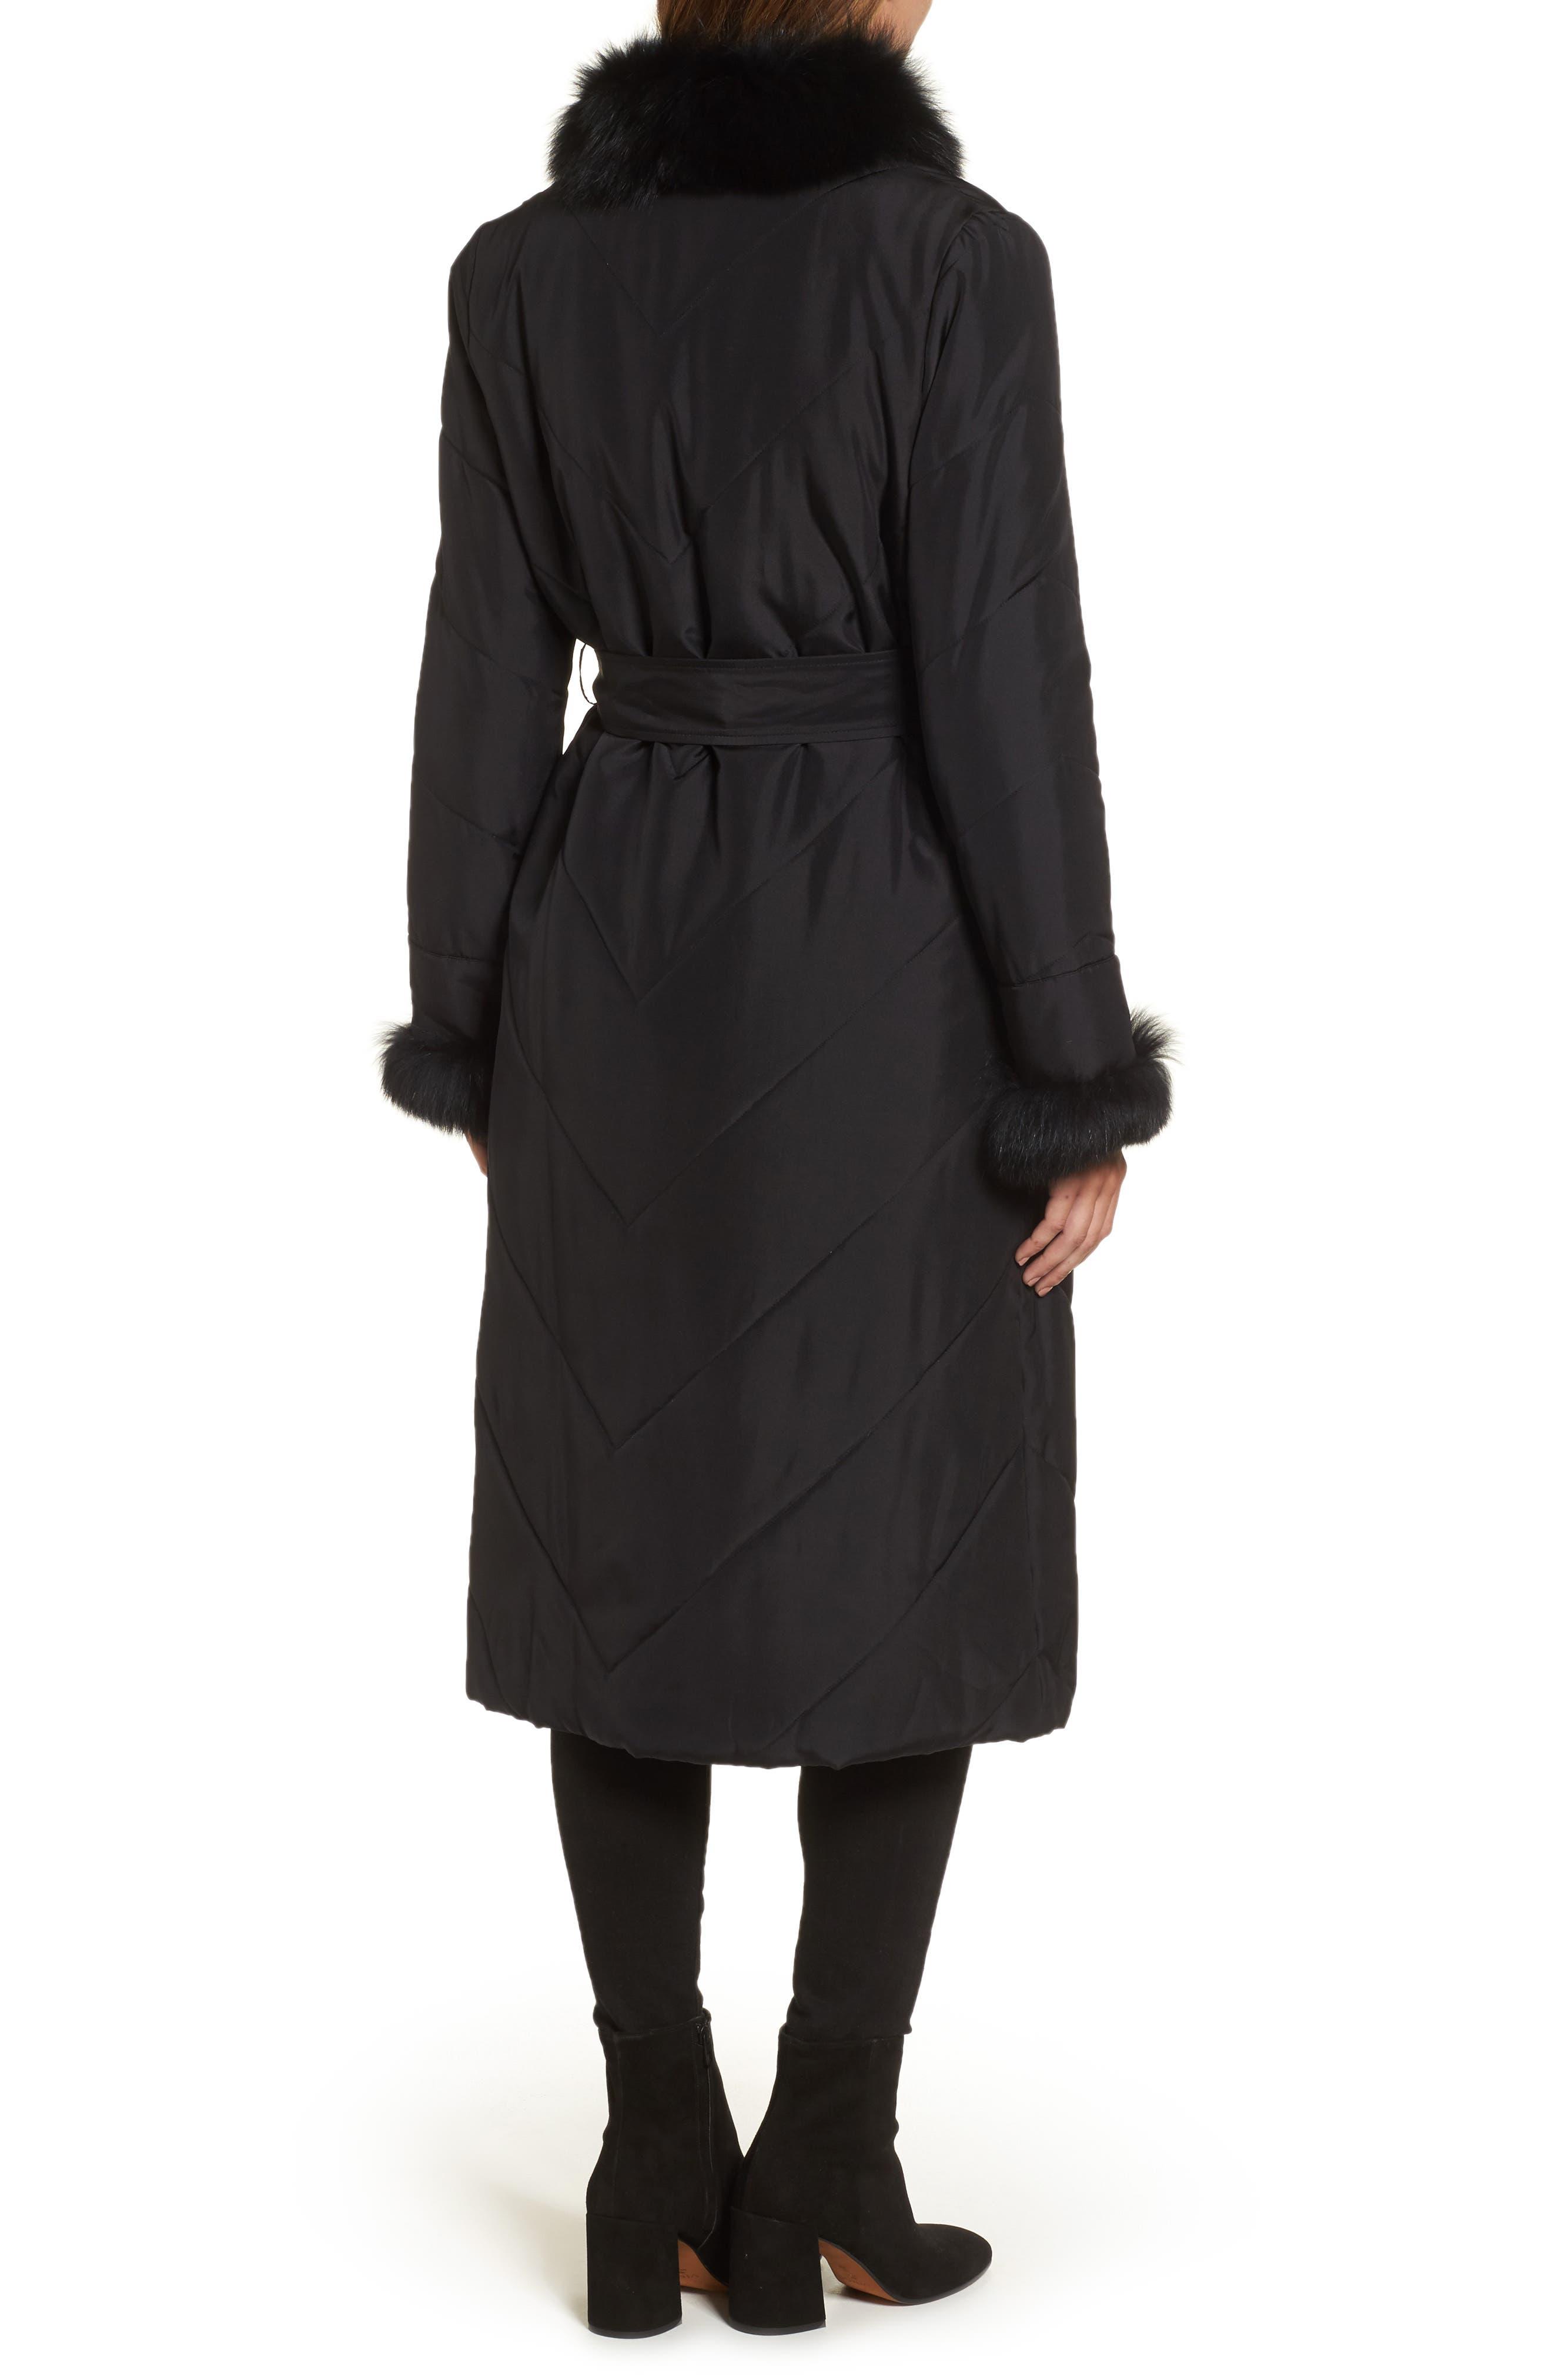 Couture Packable Silk Coat with Genuine Fox Fur & Genuine Rabbit Fur,                             Alternate thumbnail 2, color,                             001